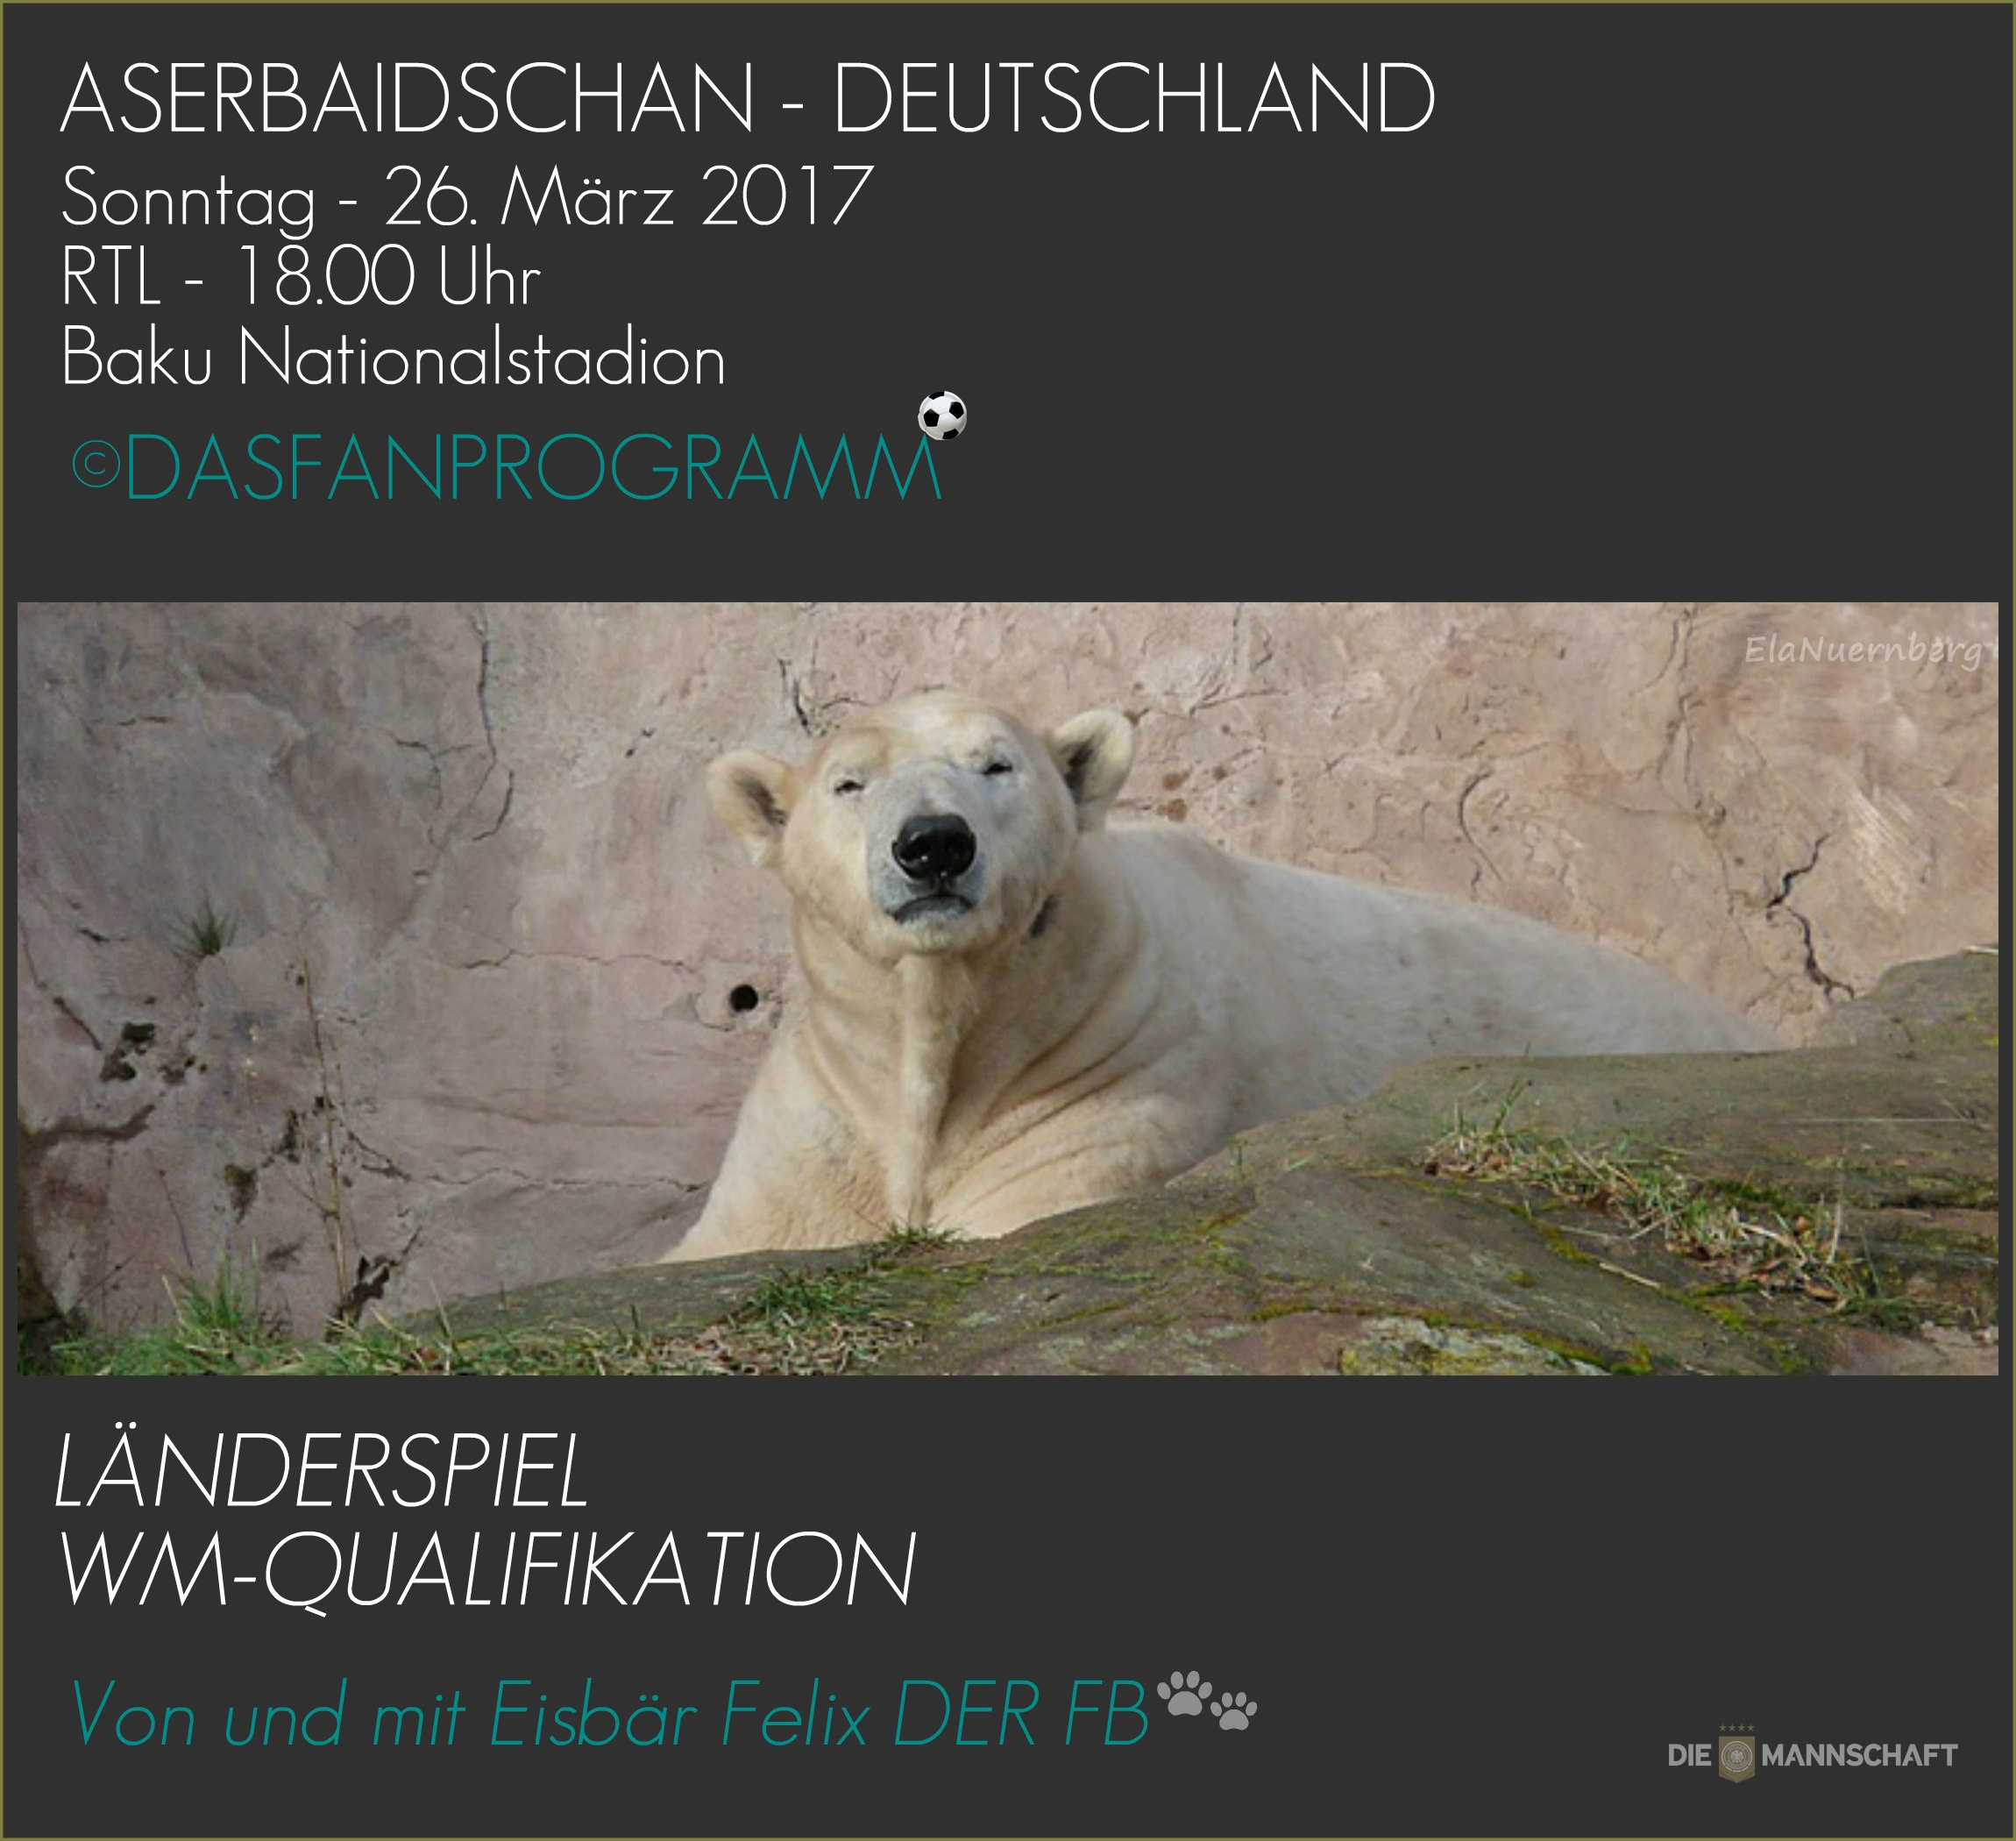 Eisbär Felix DER Fanbeauftragte liegend im Tiergarten Nürnberg